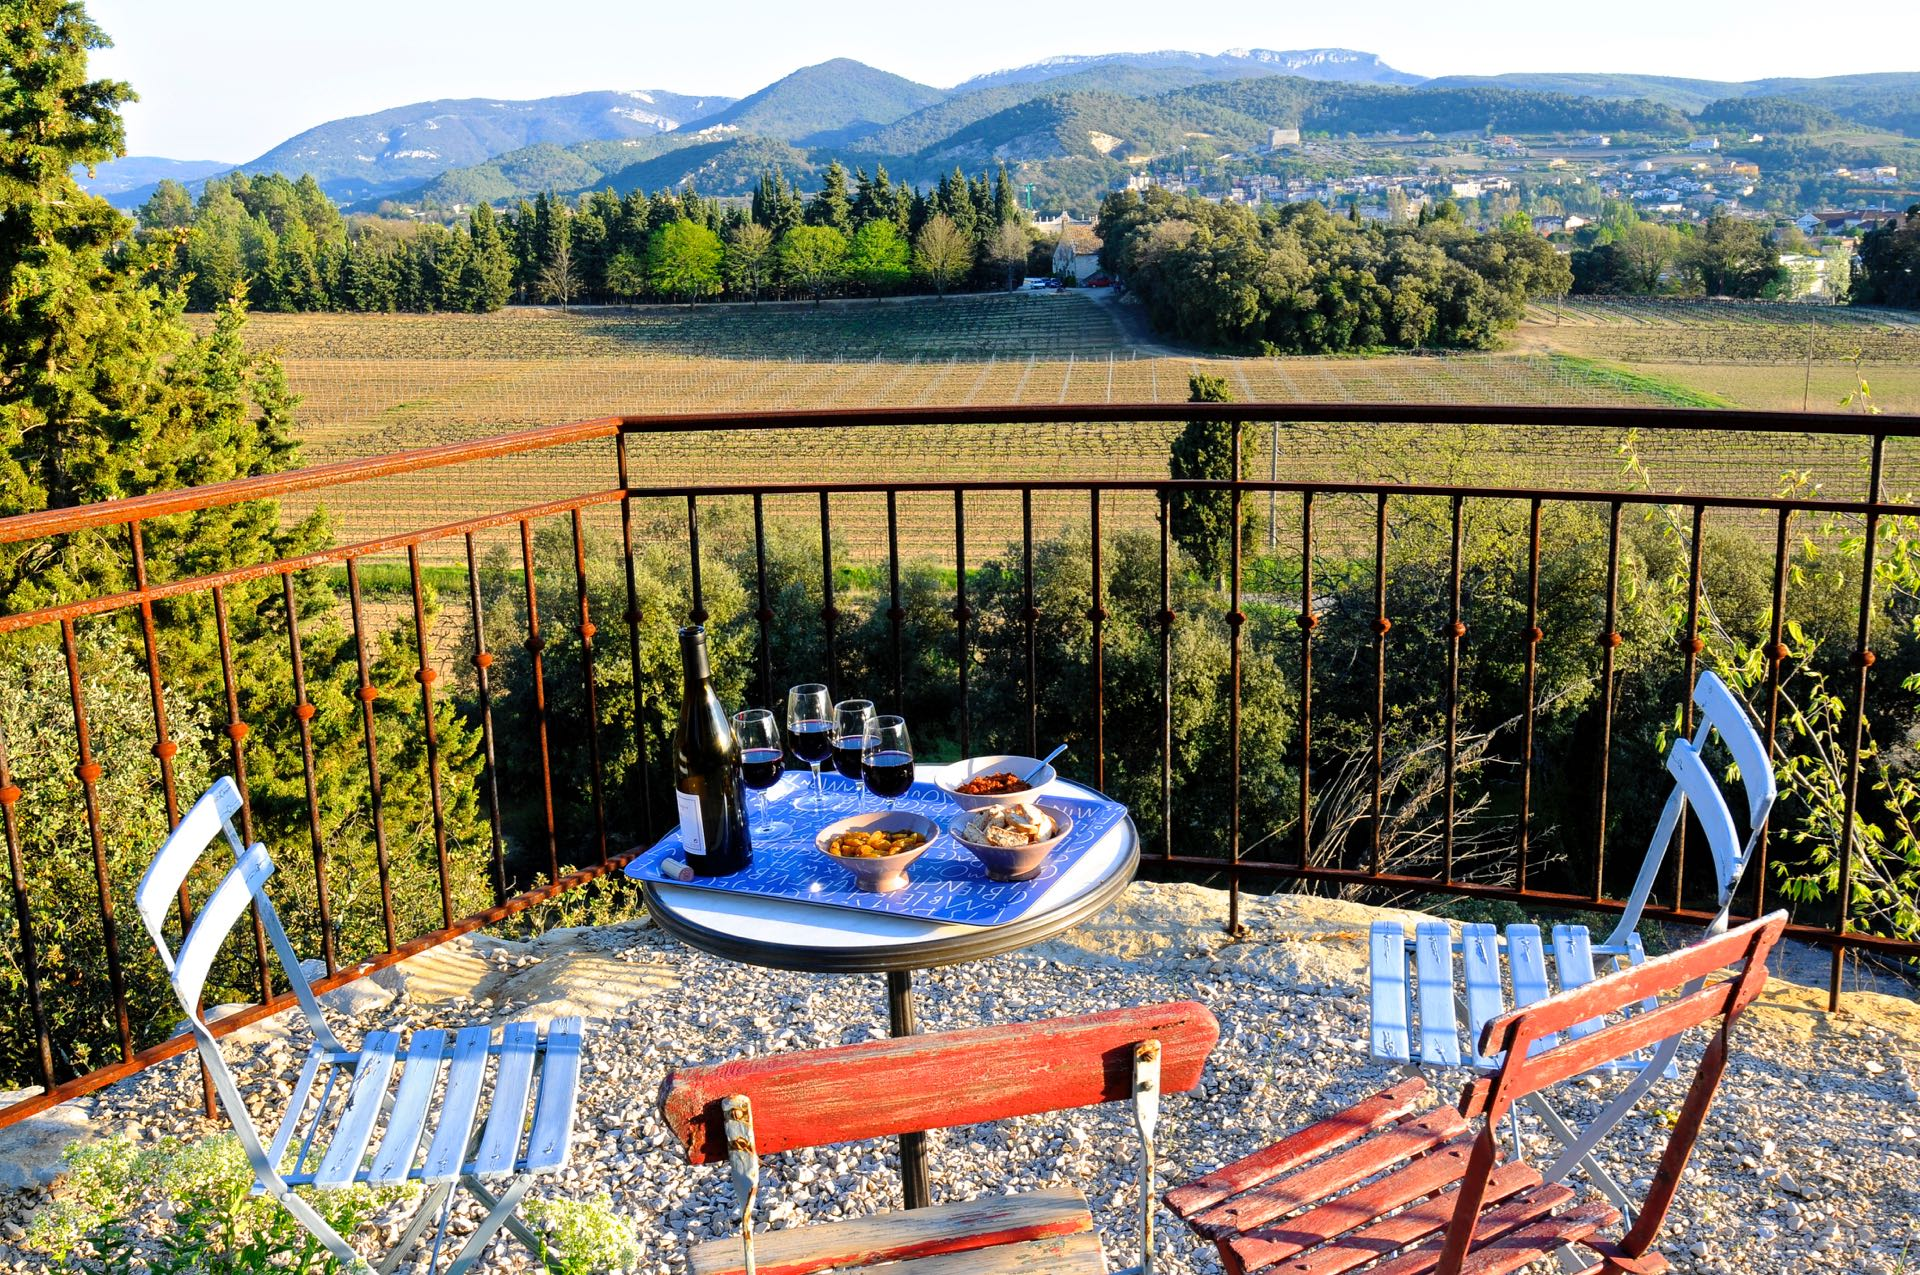 Landscape of Provence